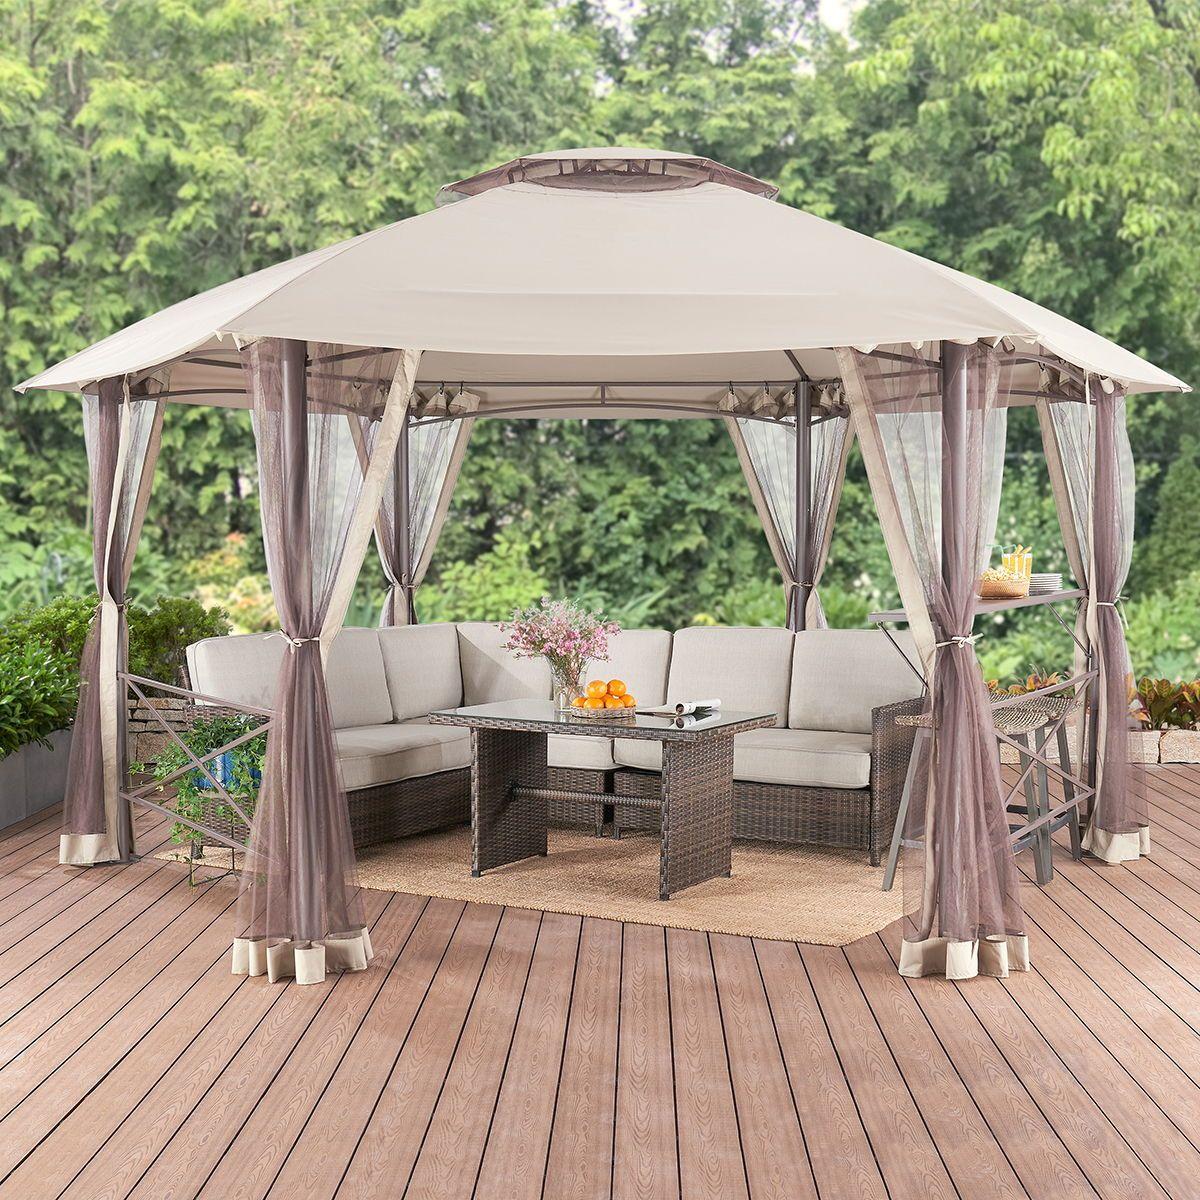 afdba54655b1a14d7cf1f9c13b49a3f1 - Better Homes And Gardens Hardtop Gazebo 10x10 Instructions